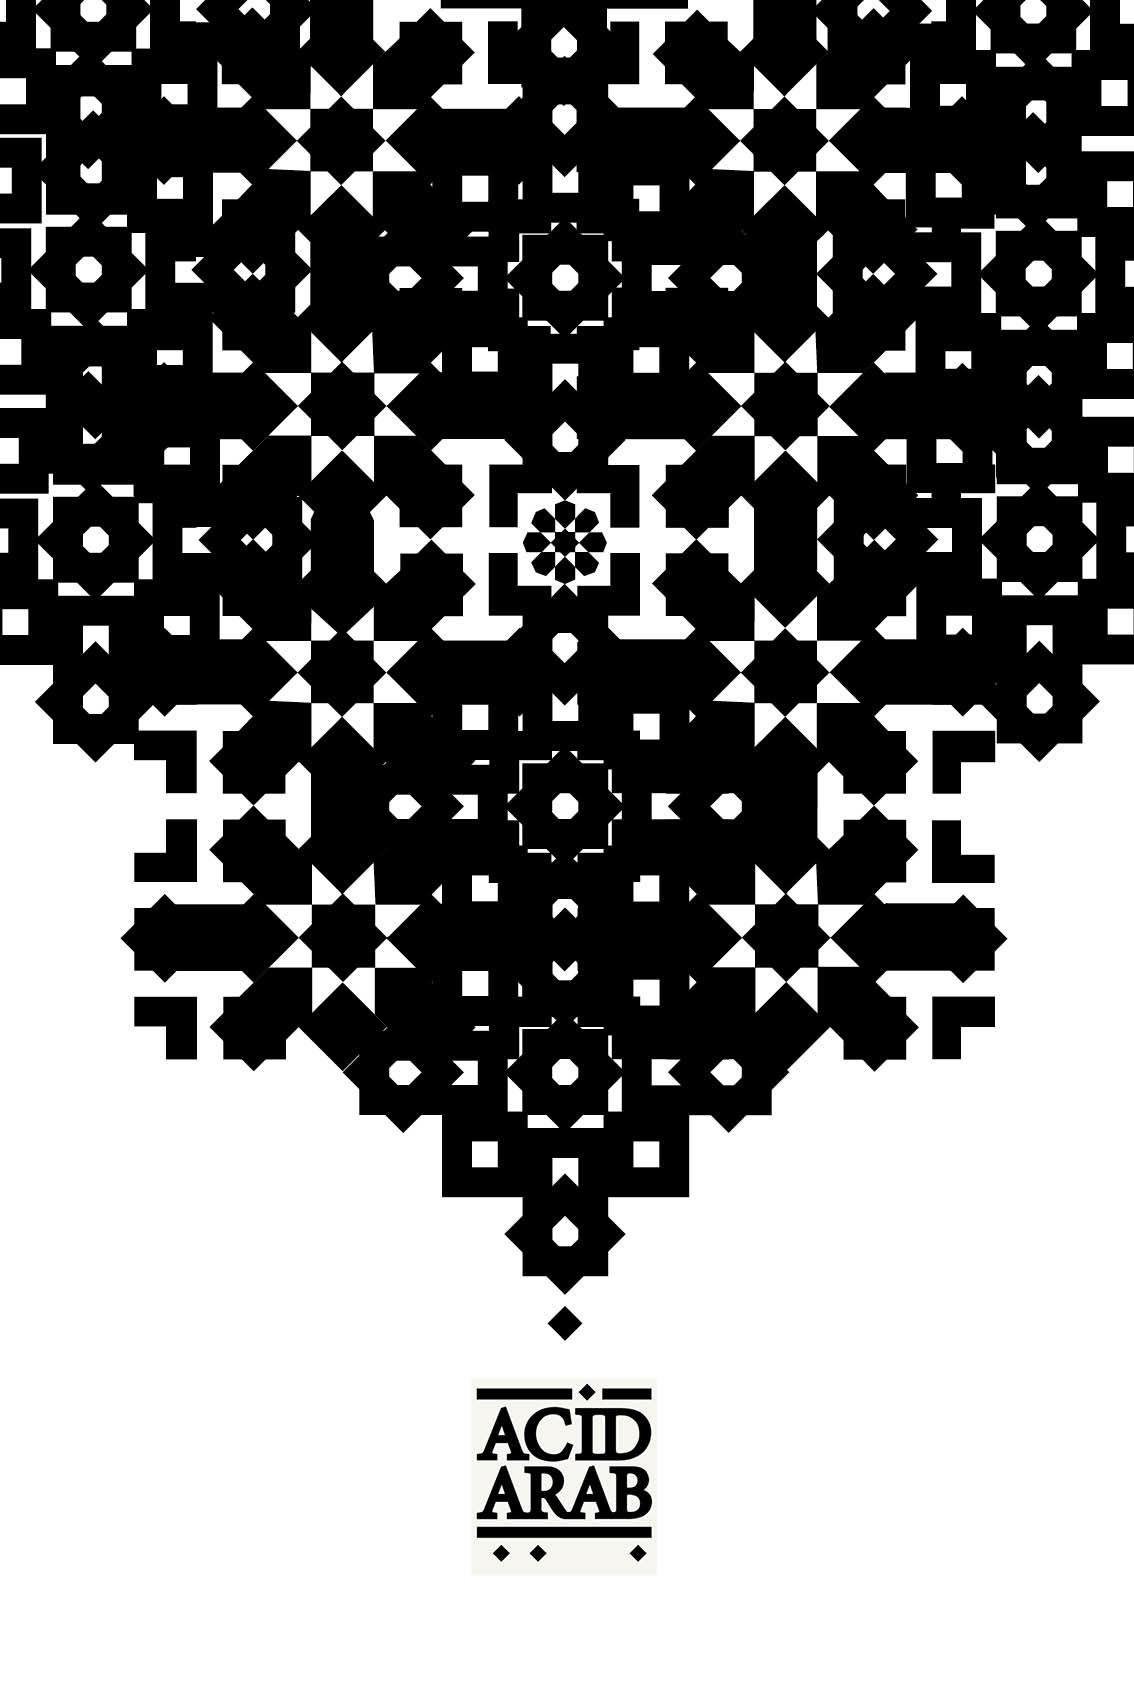 Poster / Acid Arab / projet personnel